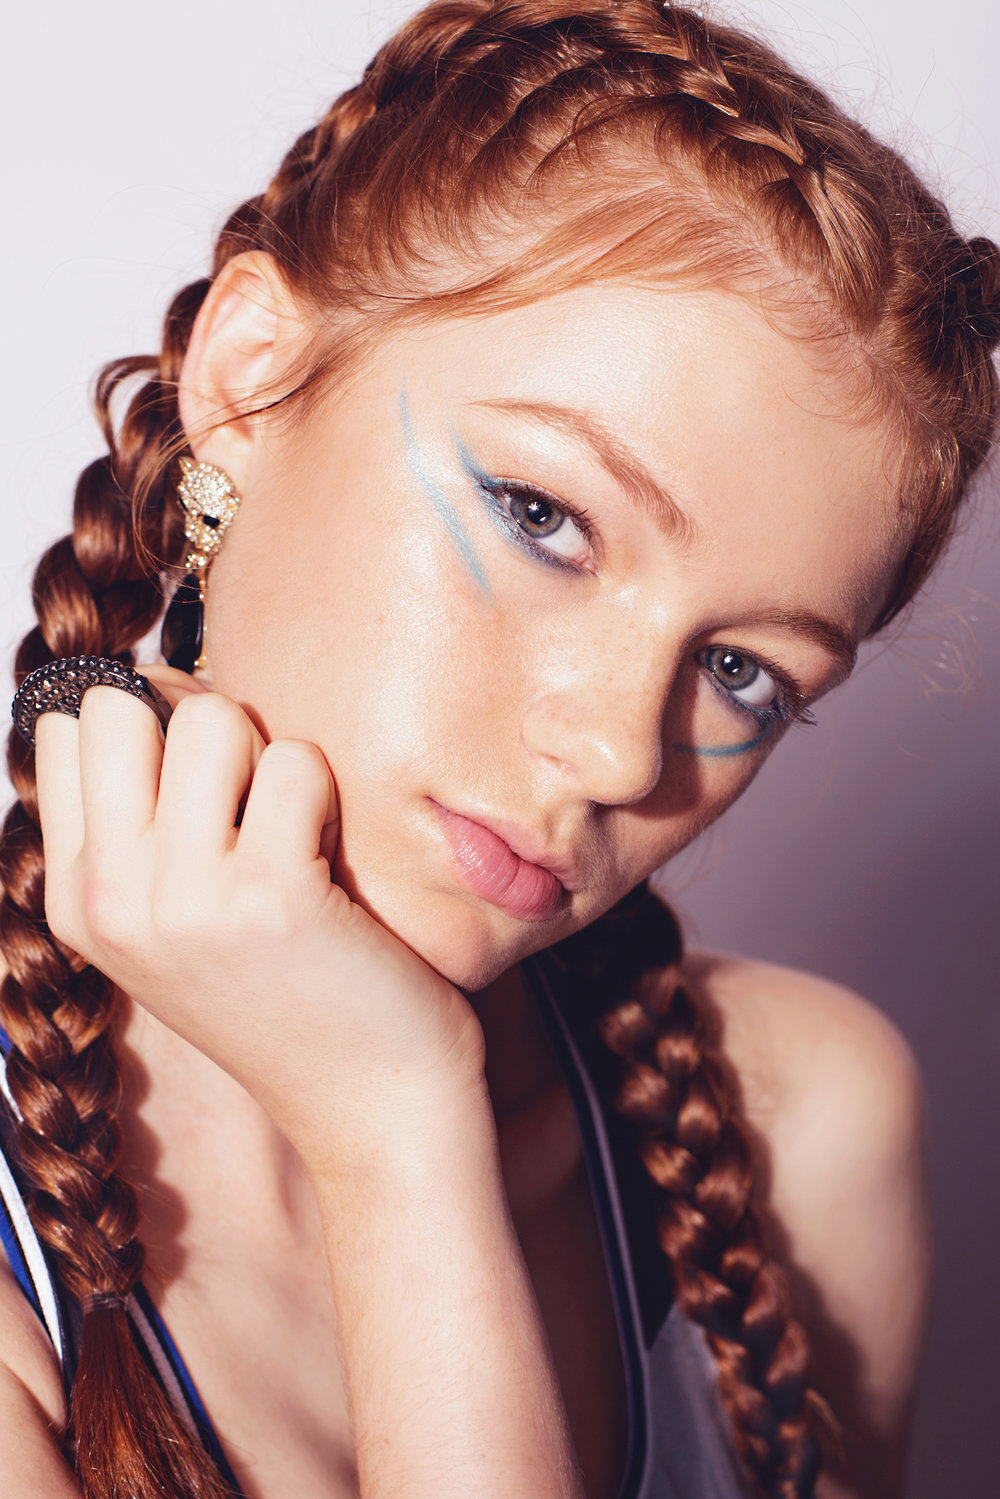 Beauty_Jasmina_Zuccarelli_Photography.jpg